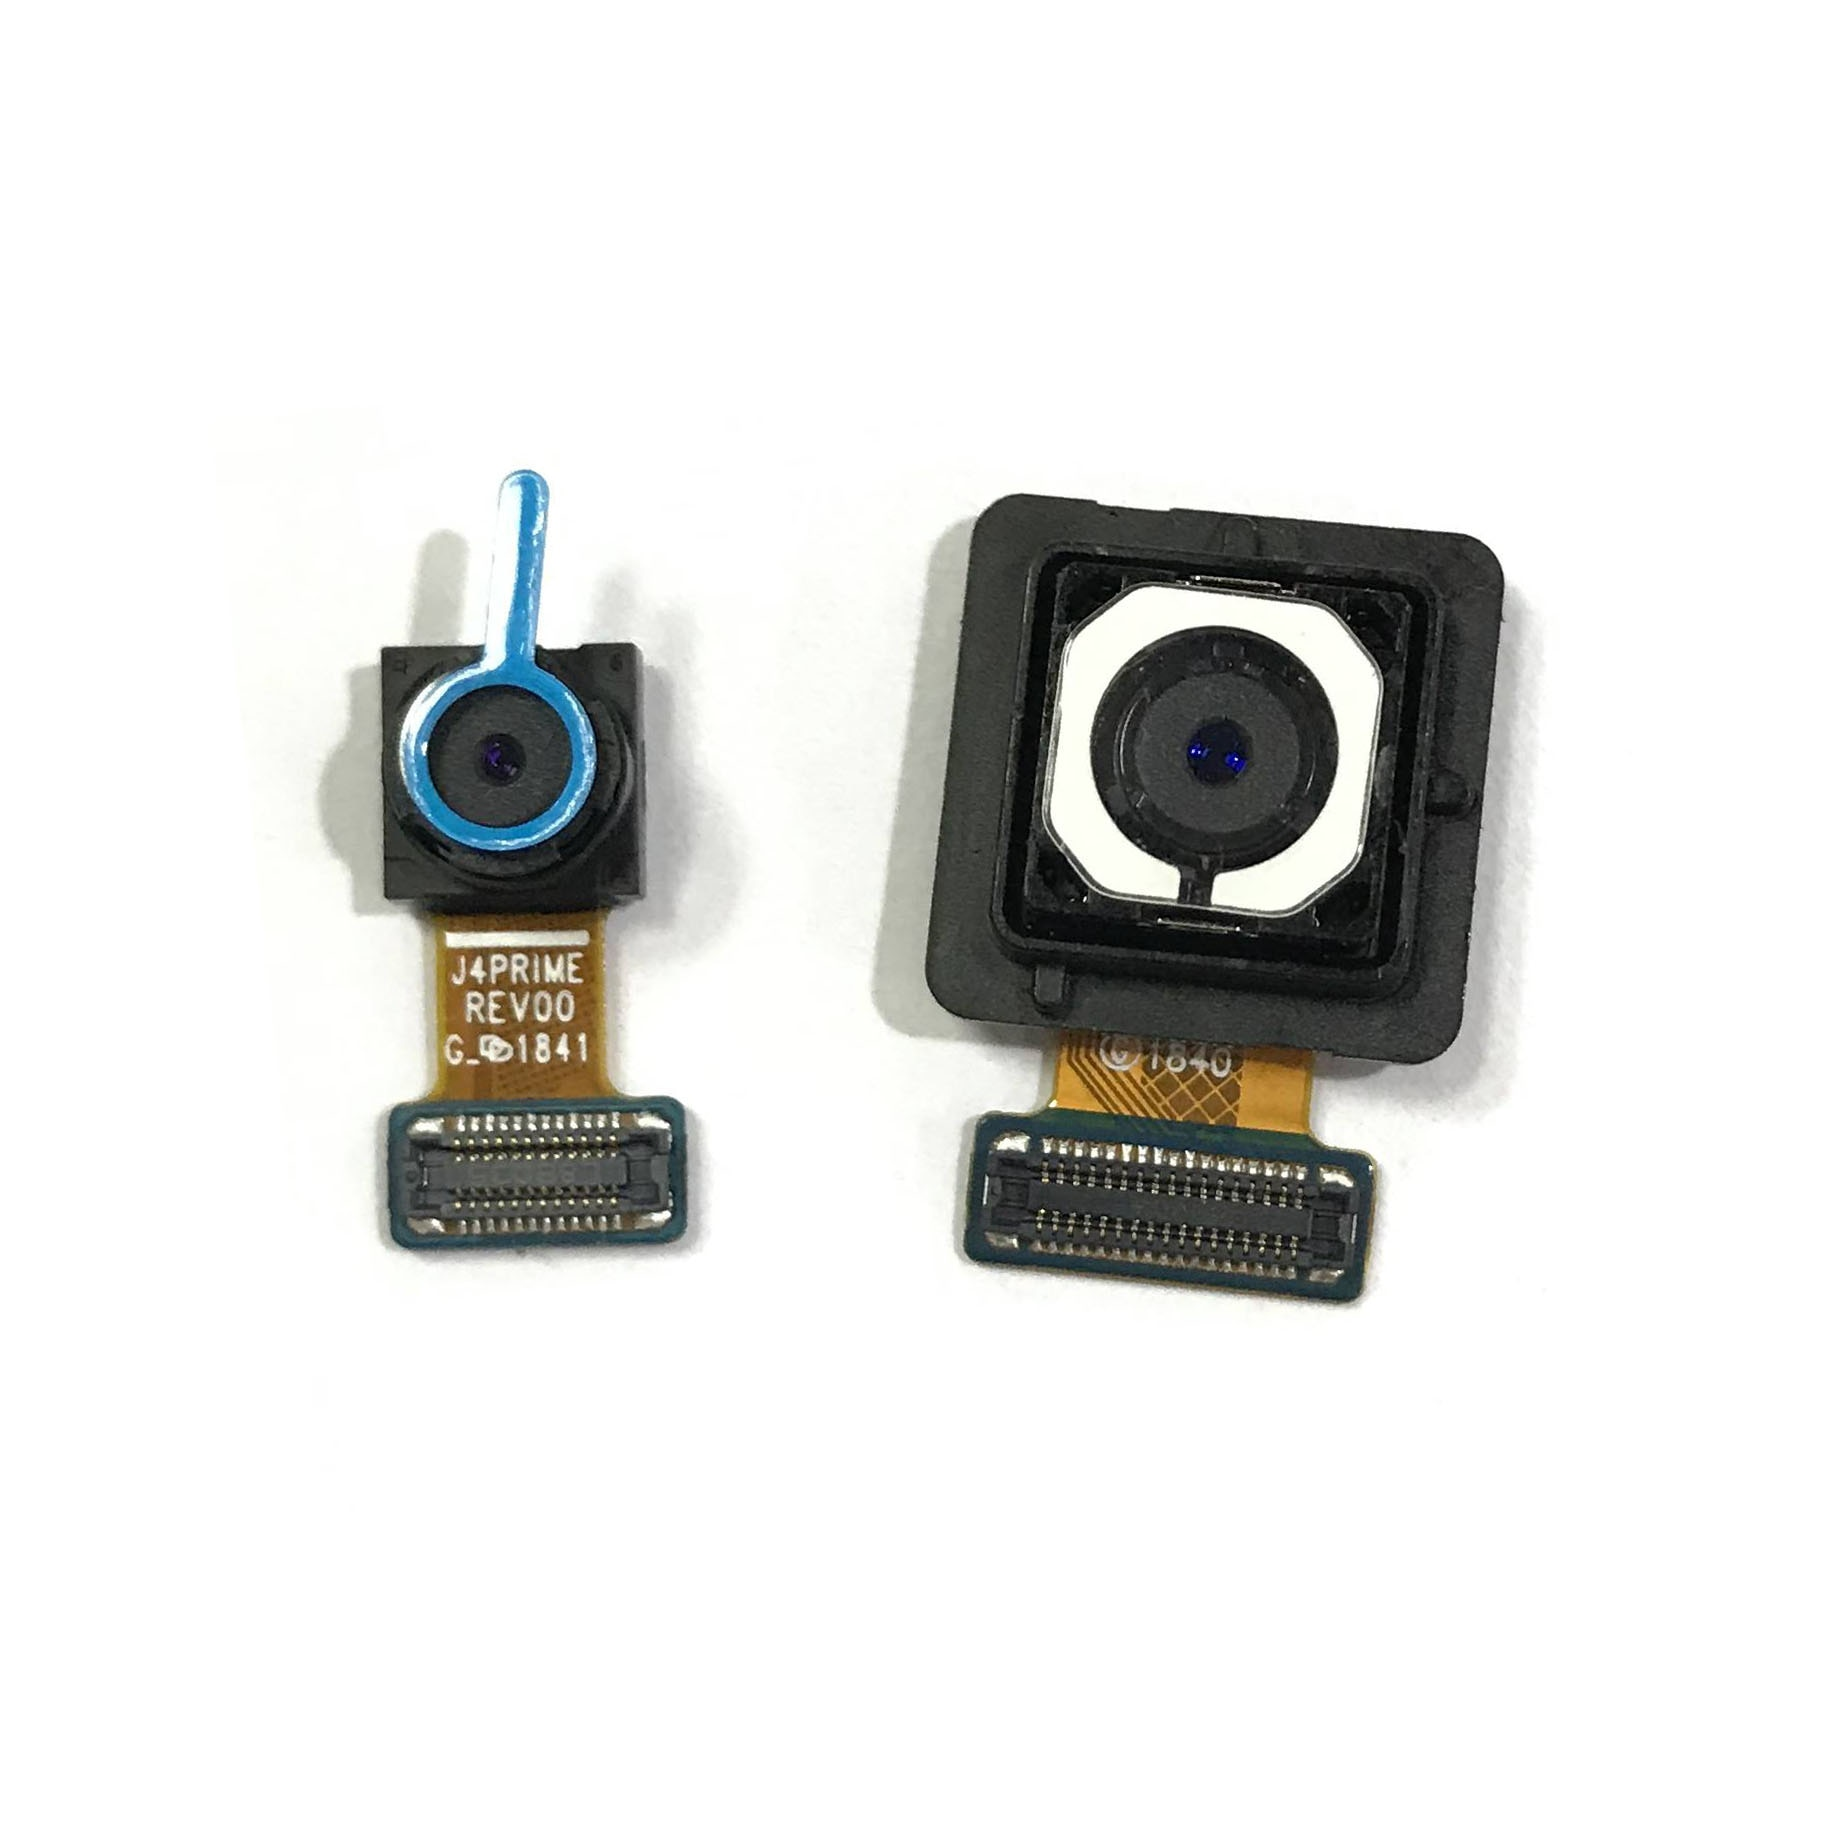 Cámara de Selfie frontal pequeña/cámara principal trasera cámara trasera para Samsung Galaxy J4 core (2018) J410 J410F J410DS